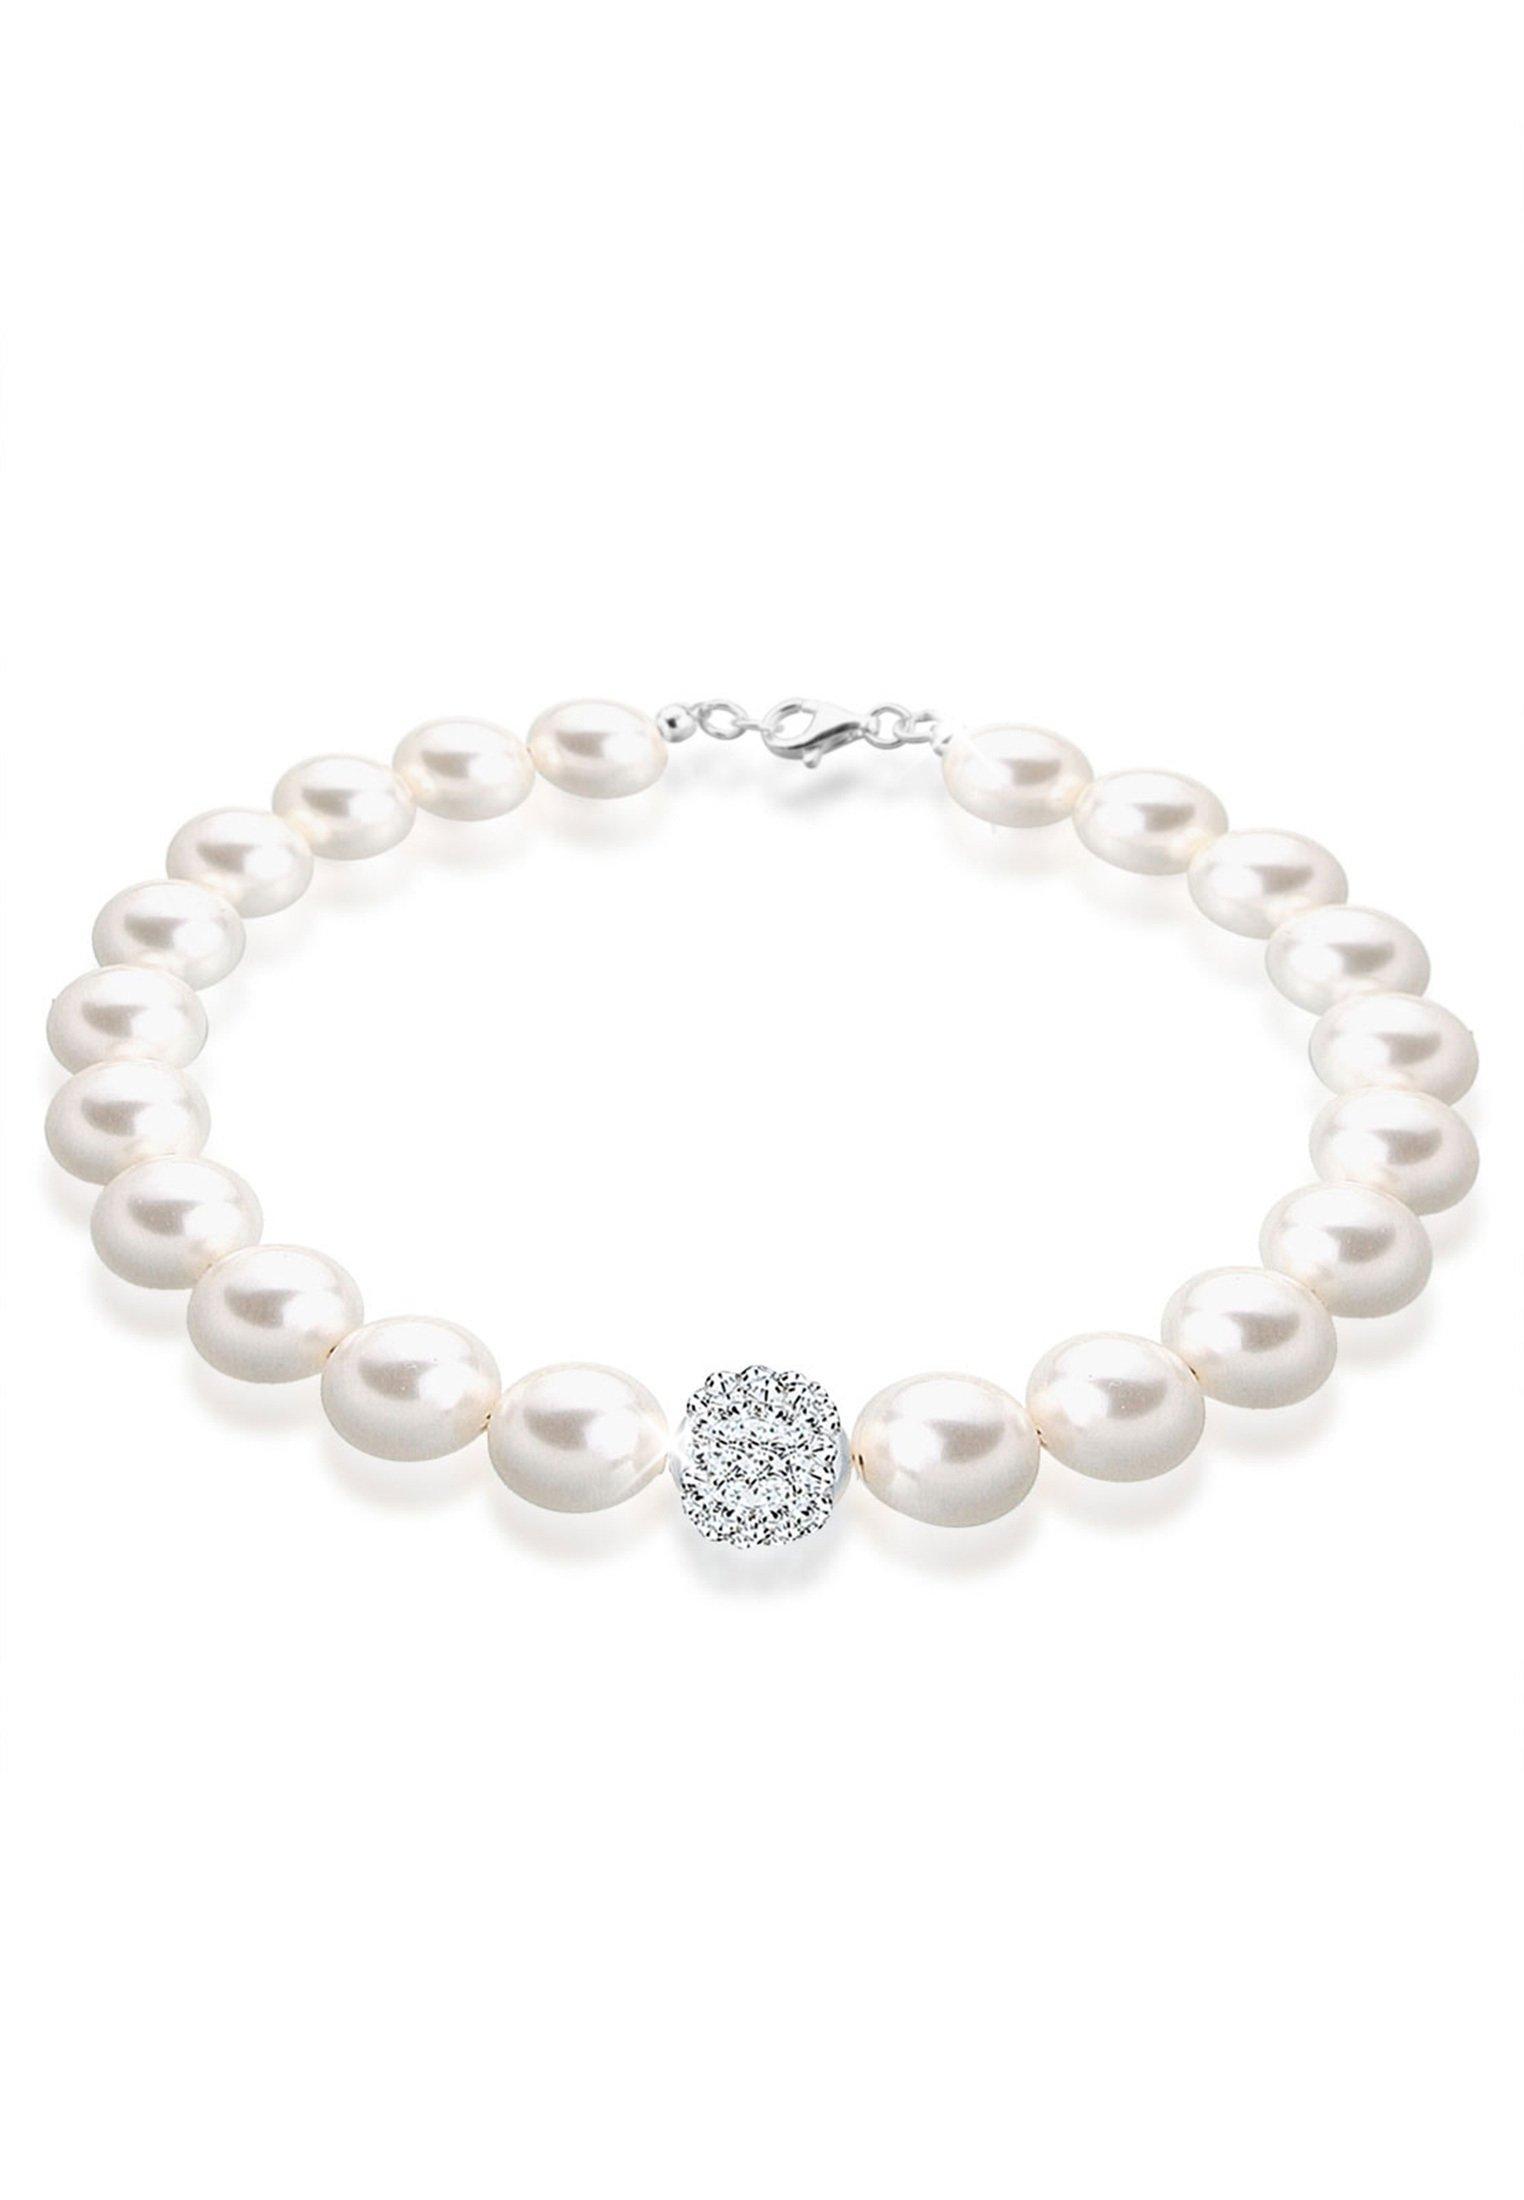 PERLU Perlenarmband Perlen Swarovski Kristalle 925 Sterling Silber